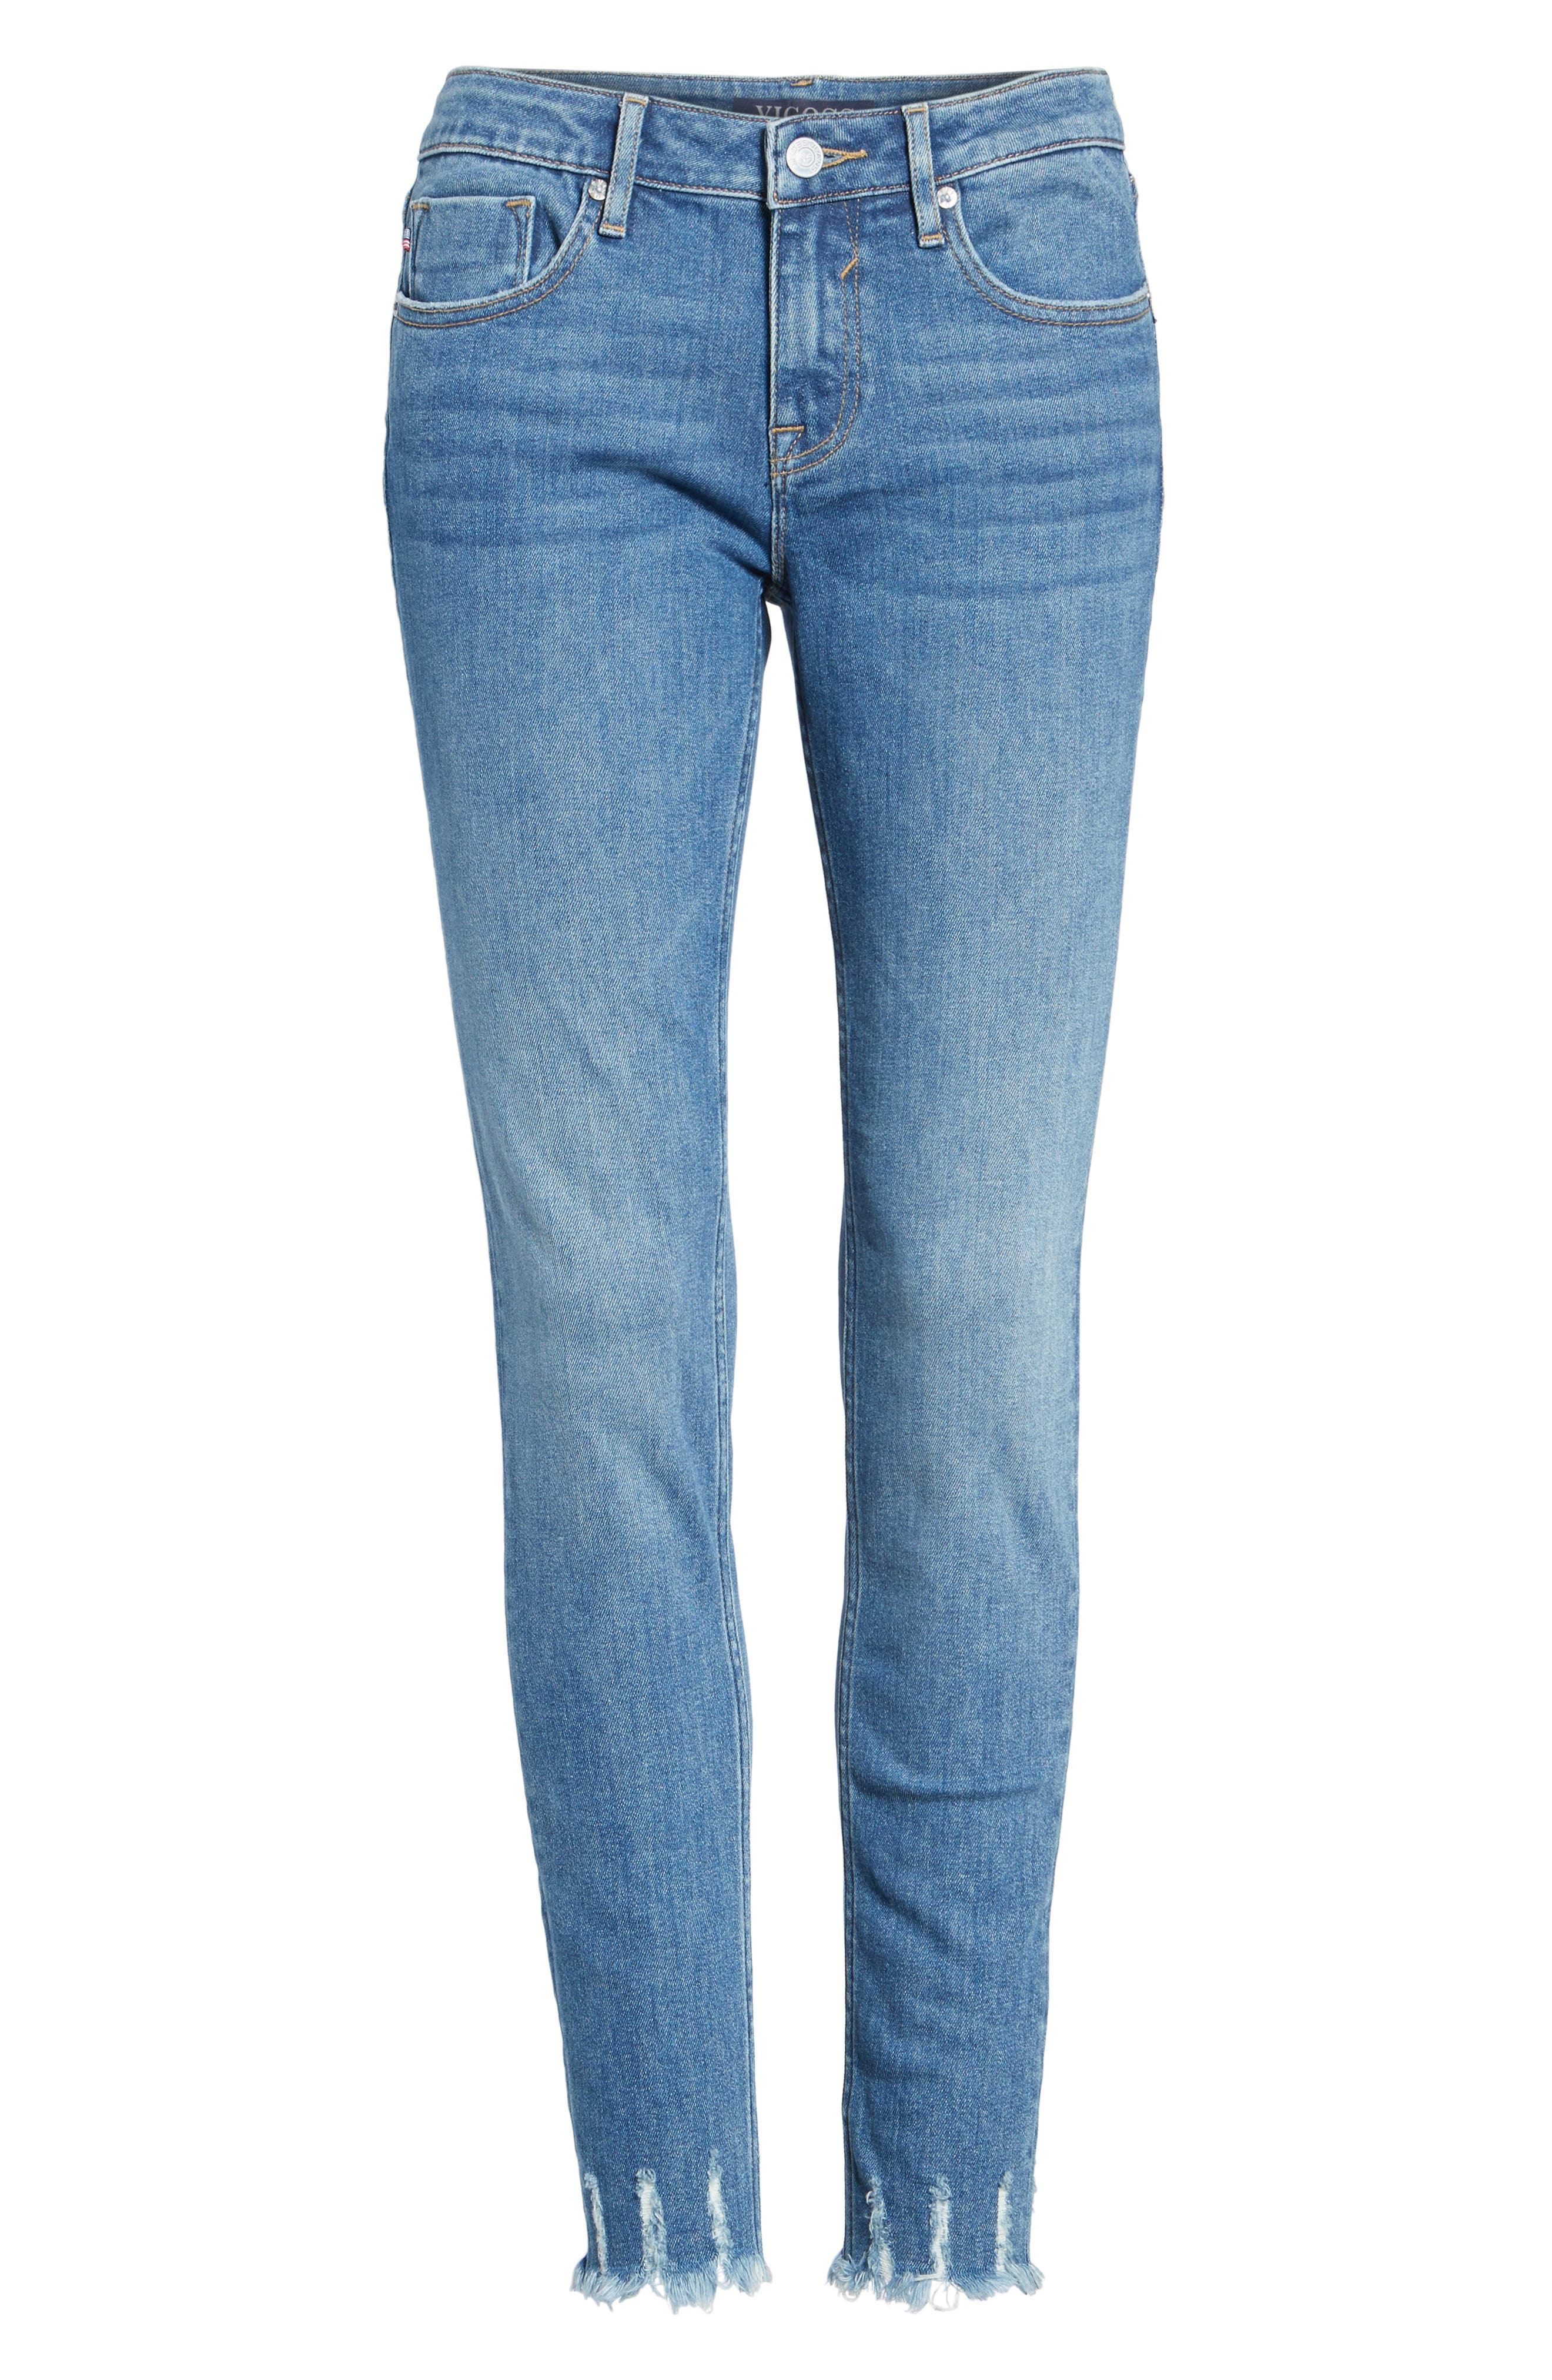 Jagger Skinny Jeans,                             Alternate thumbnail 6, color,                             426